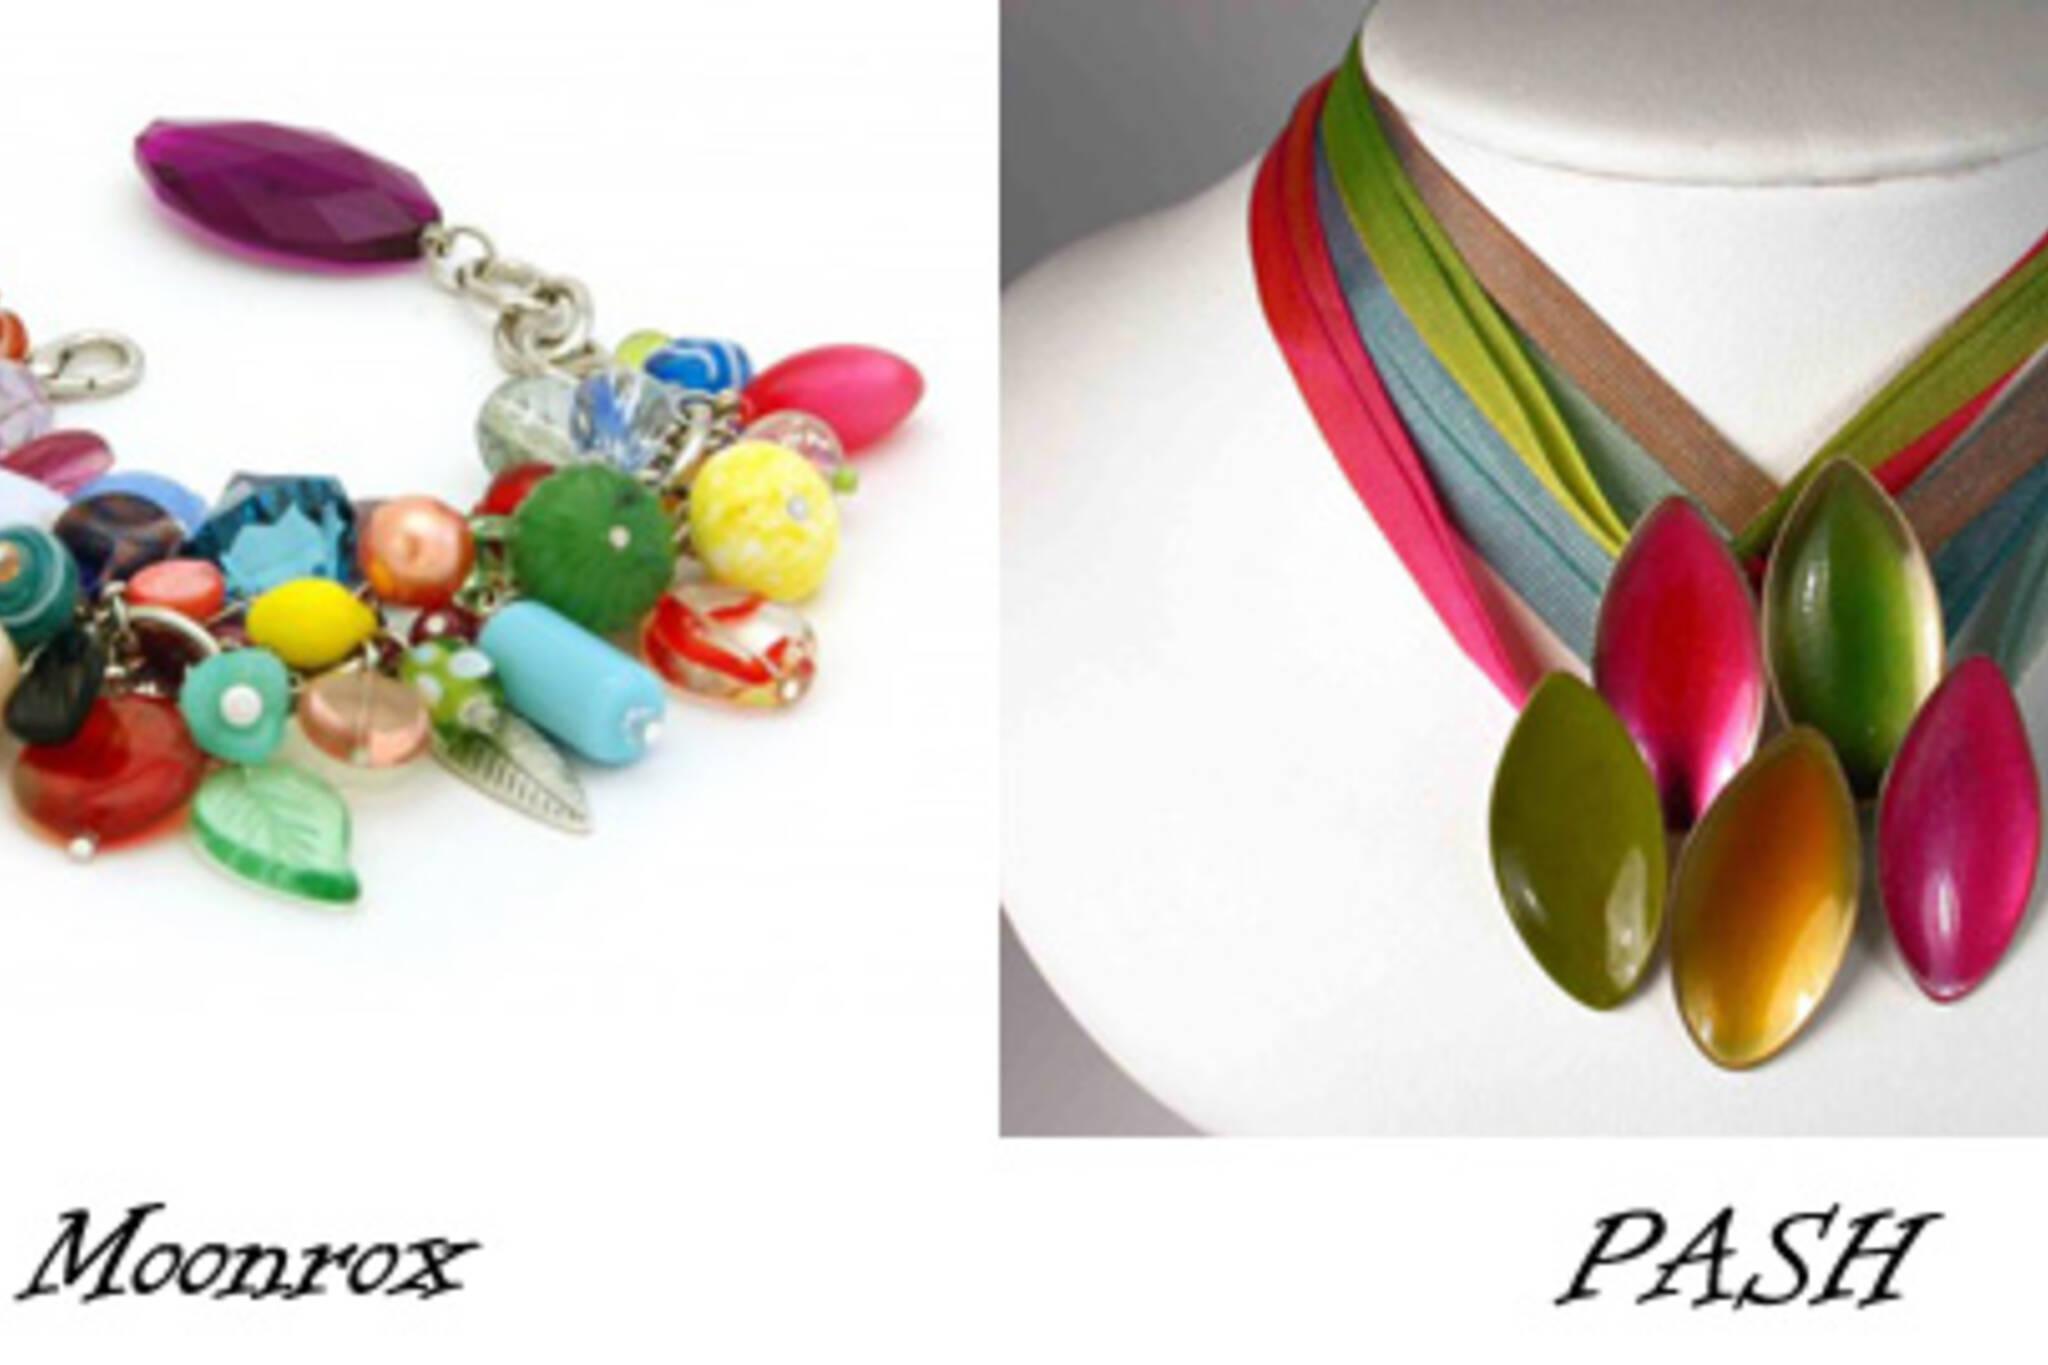 Moonrox and PASH Jewellery